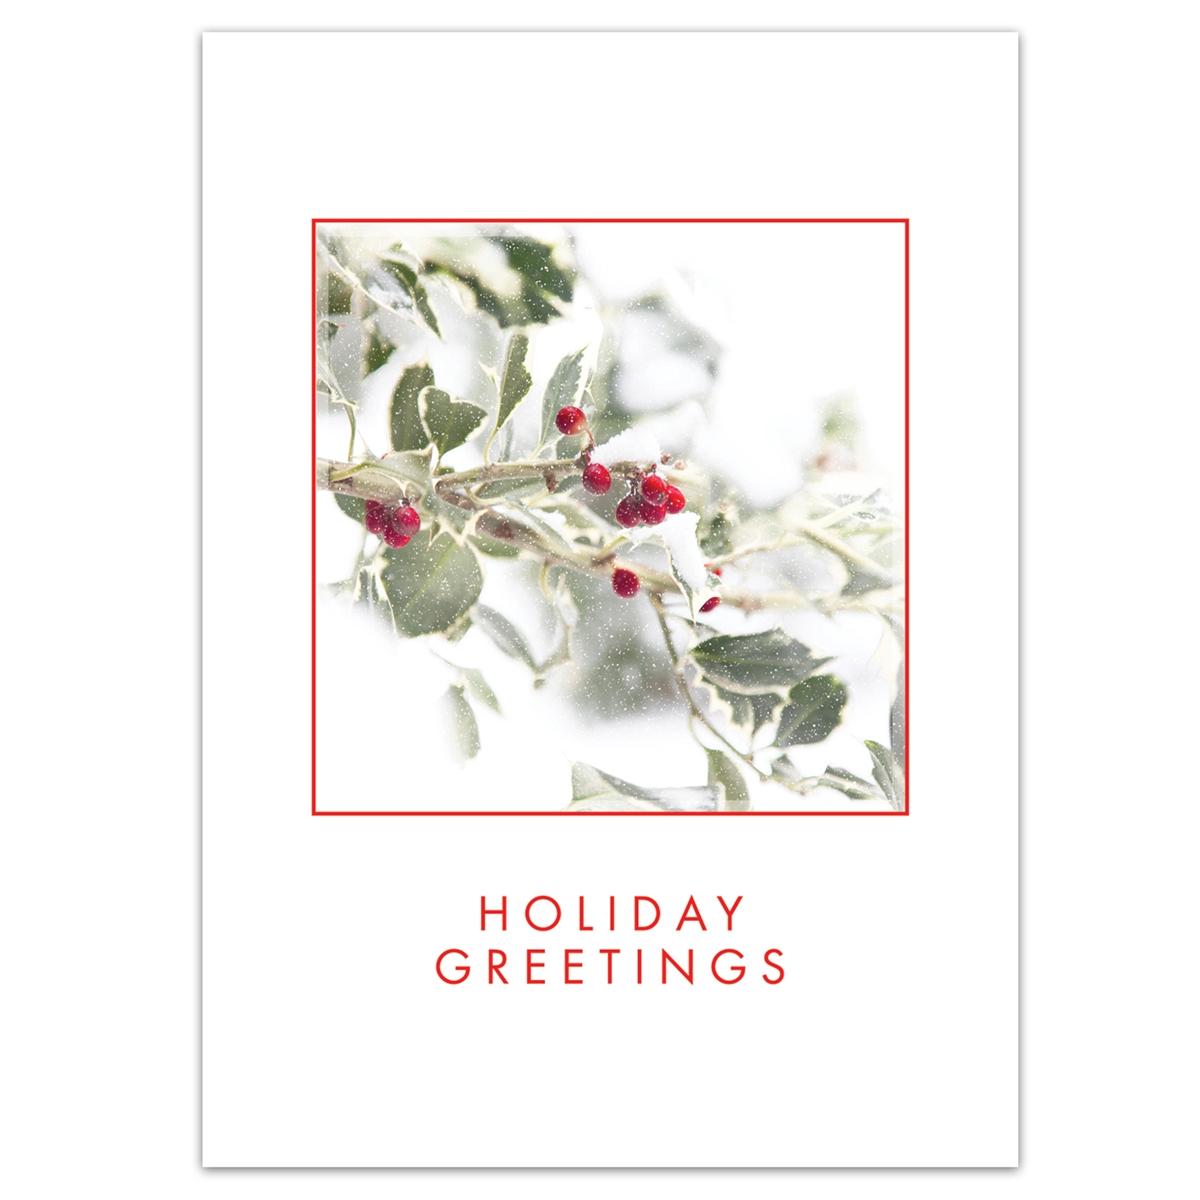 Holly Greetings Card